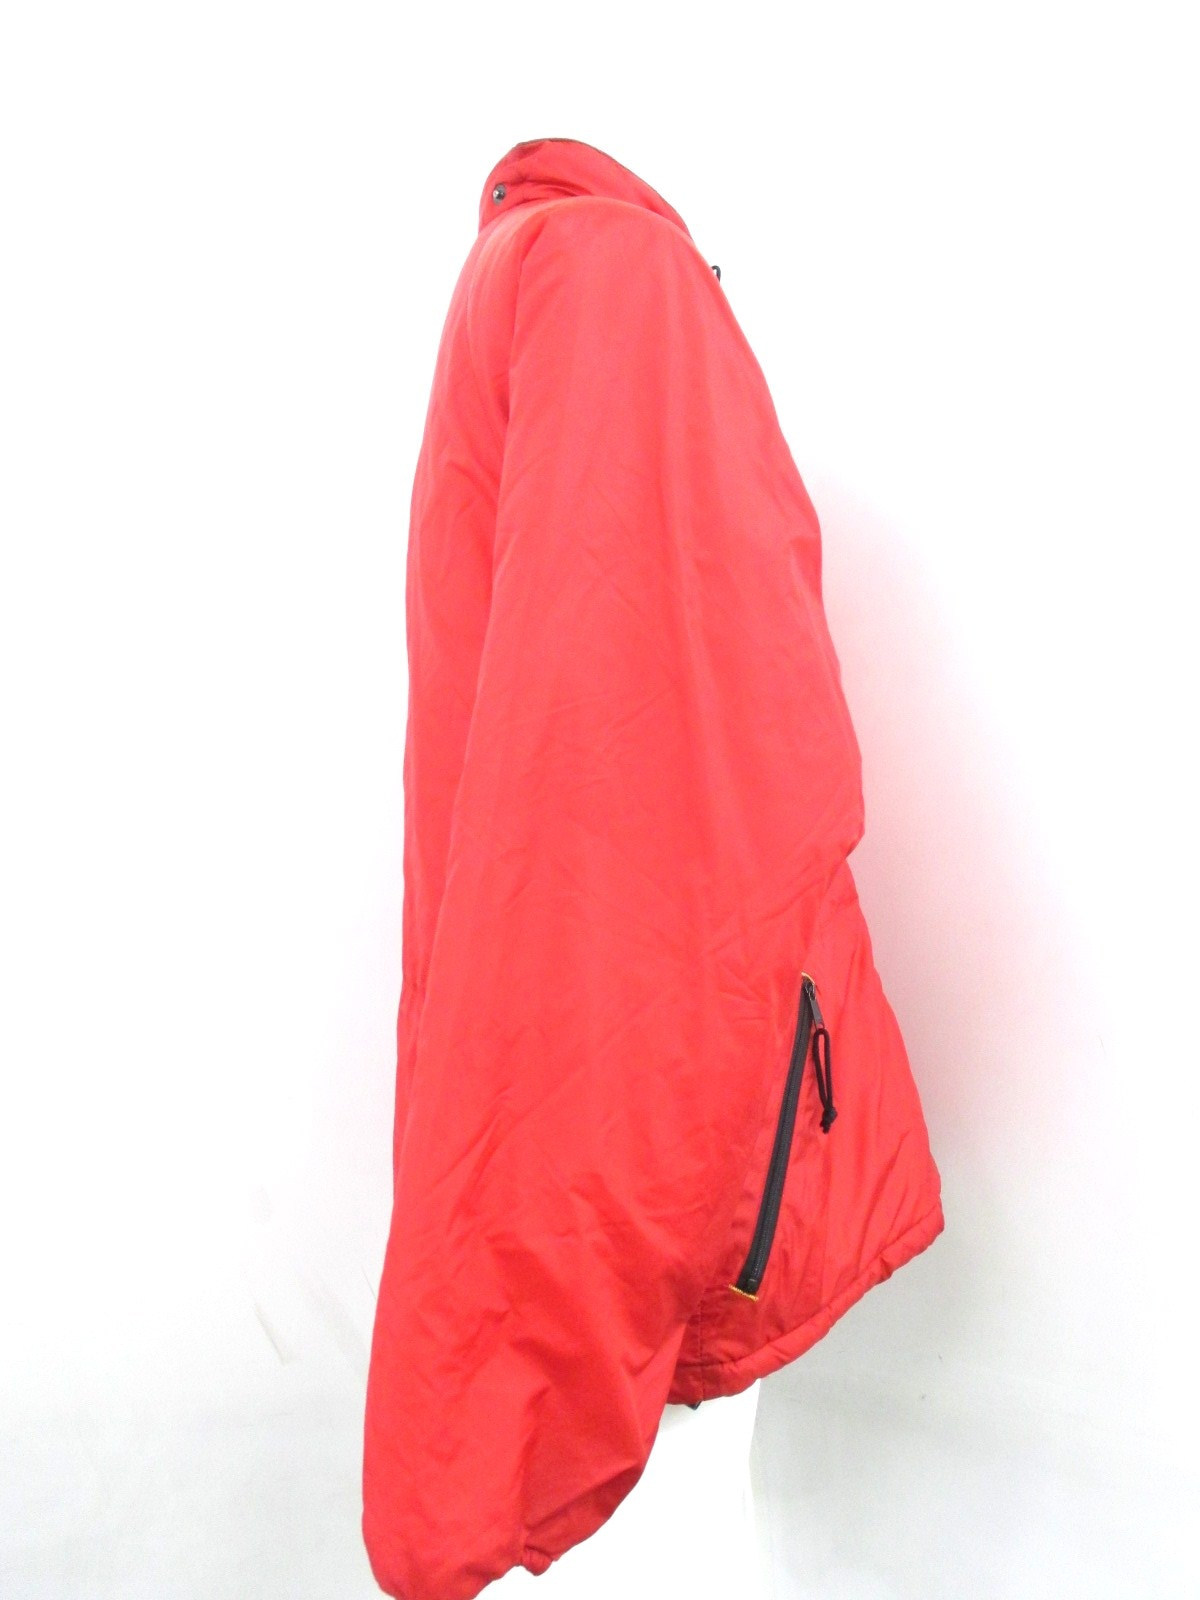 GOLITE(ゴーライト)のダウンジャケット